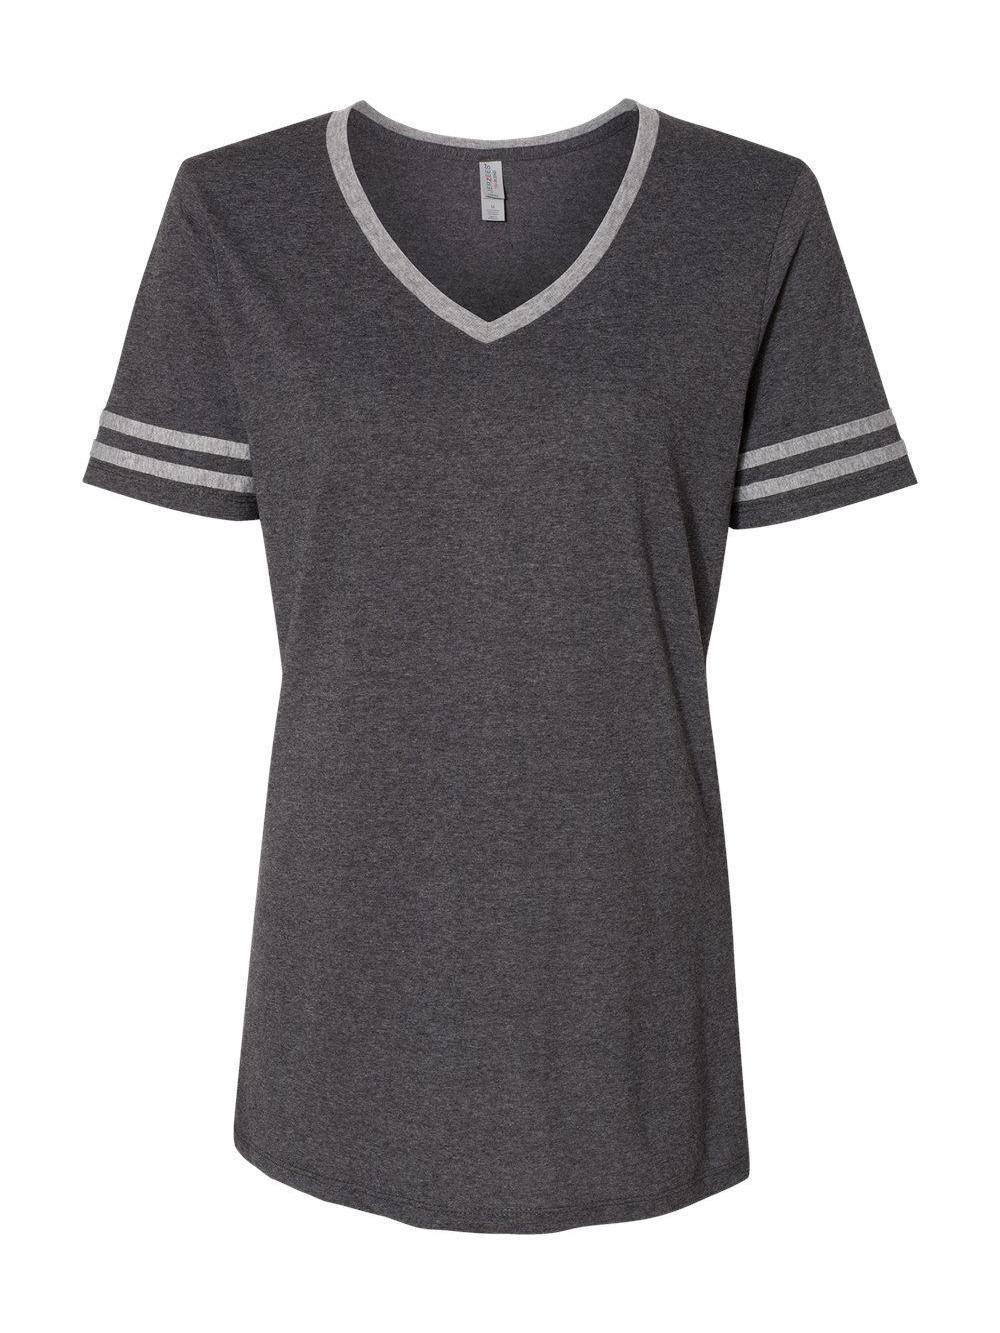 Jerzees-Triblend-Women-039-s-V-Neck-Varsity-T-Shirt-602WVR thumbnail 3